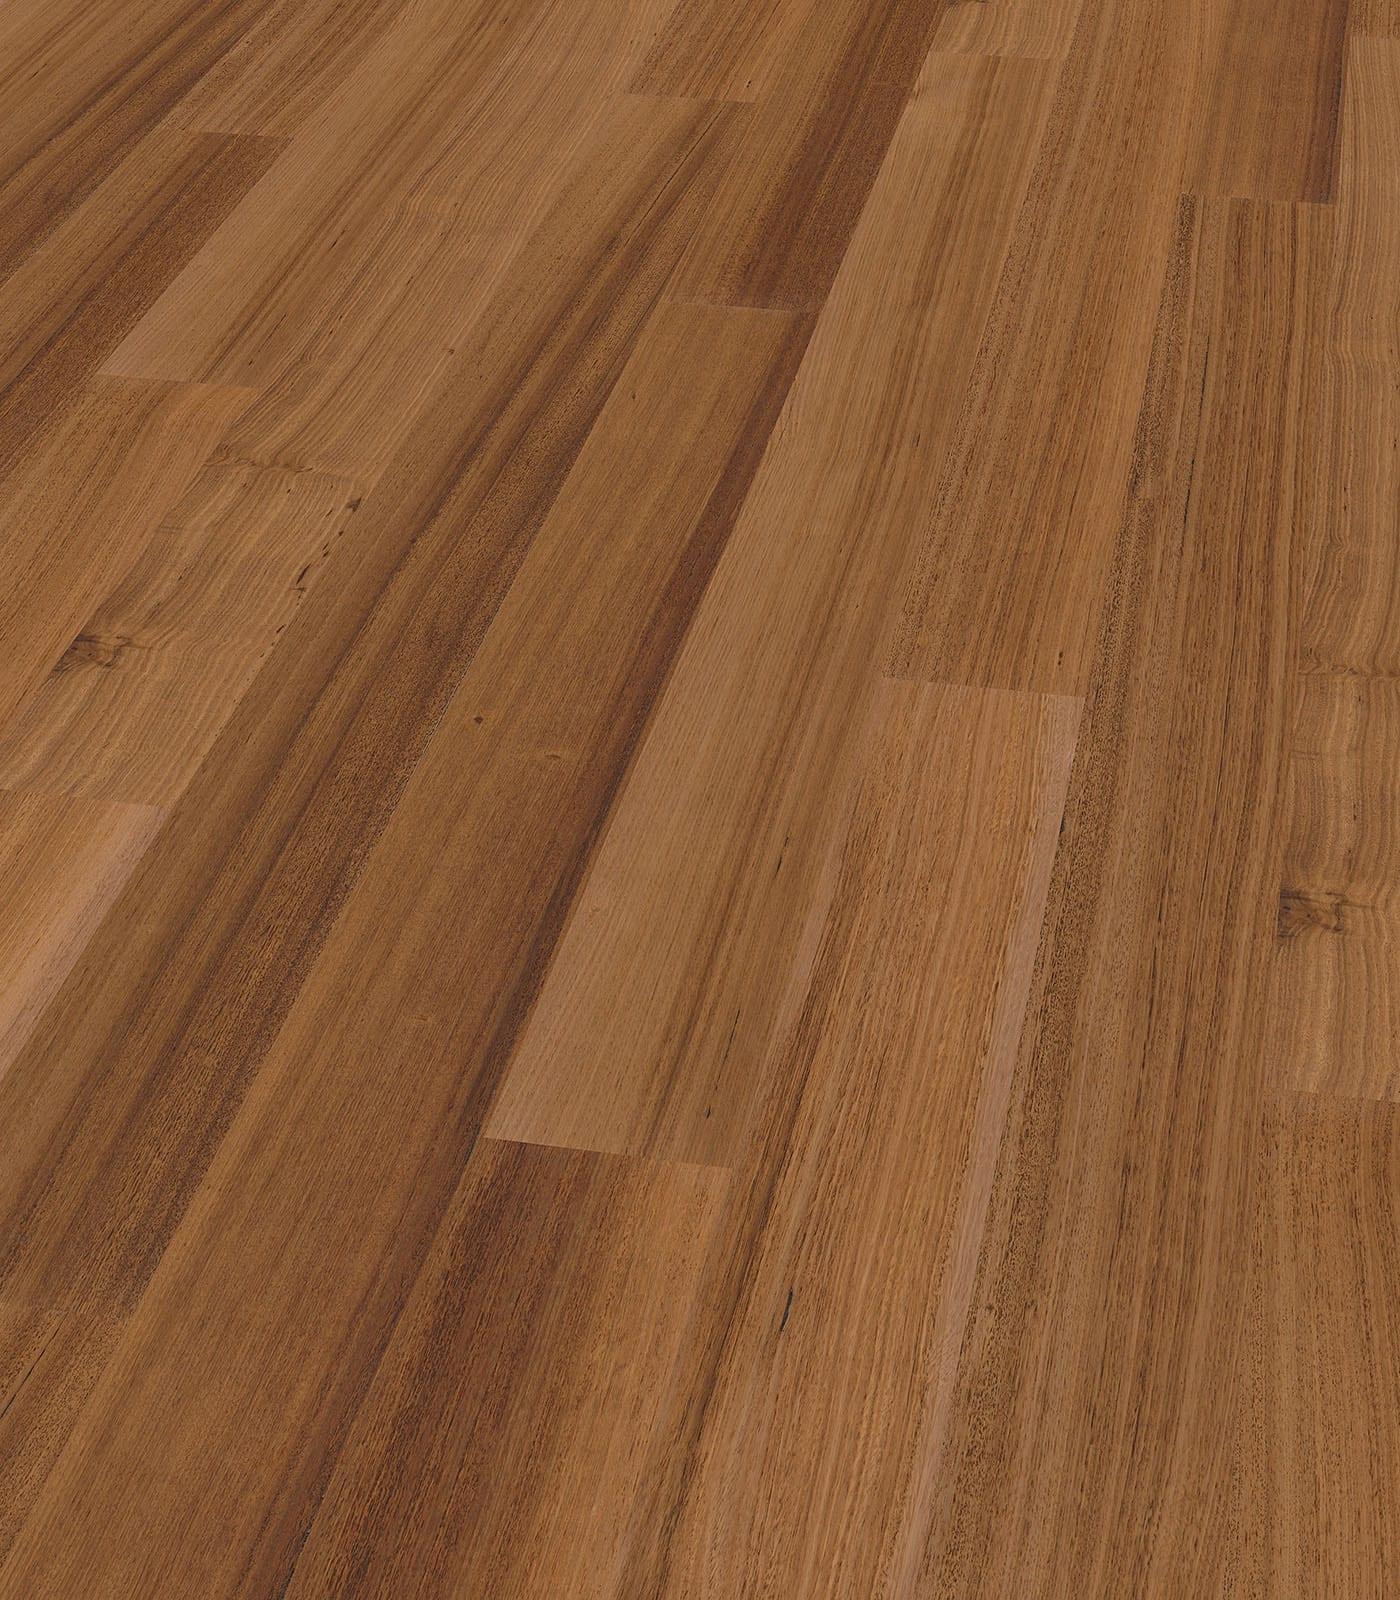 Fremantle-Tasmanian Oak Floors-After Oak Collection-angle